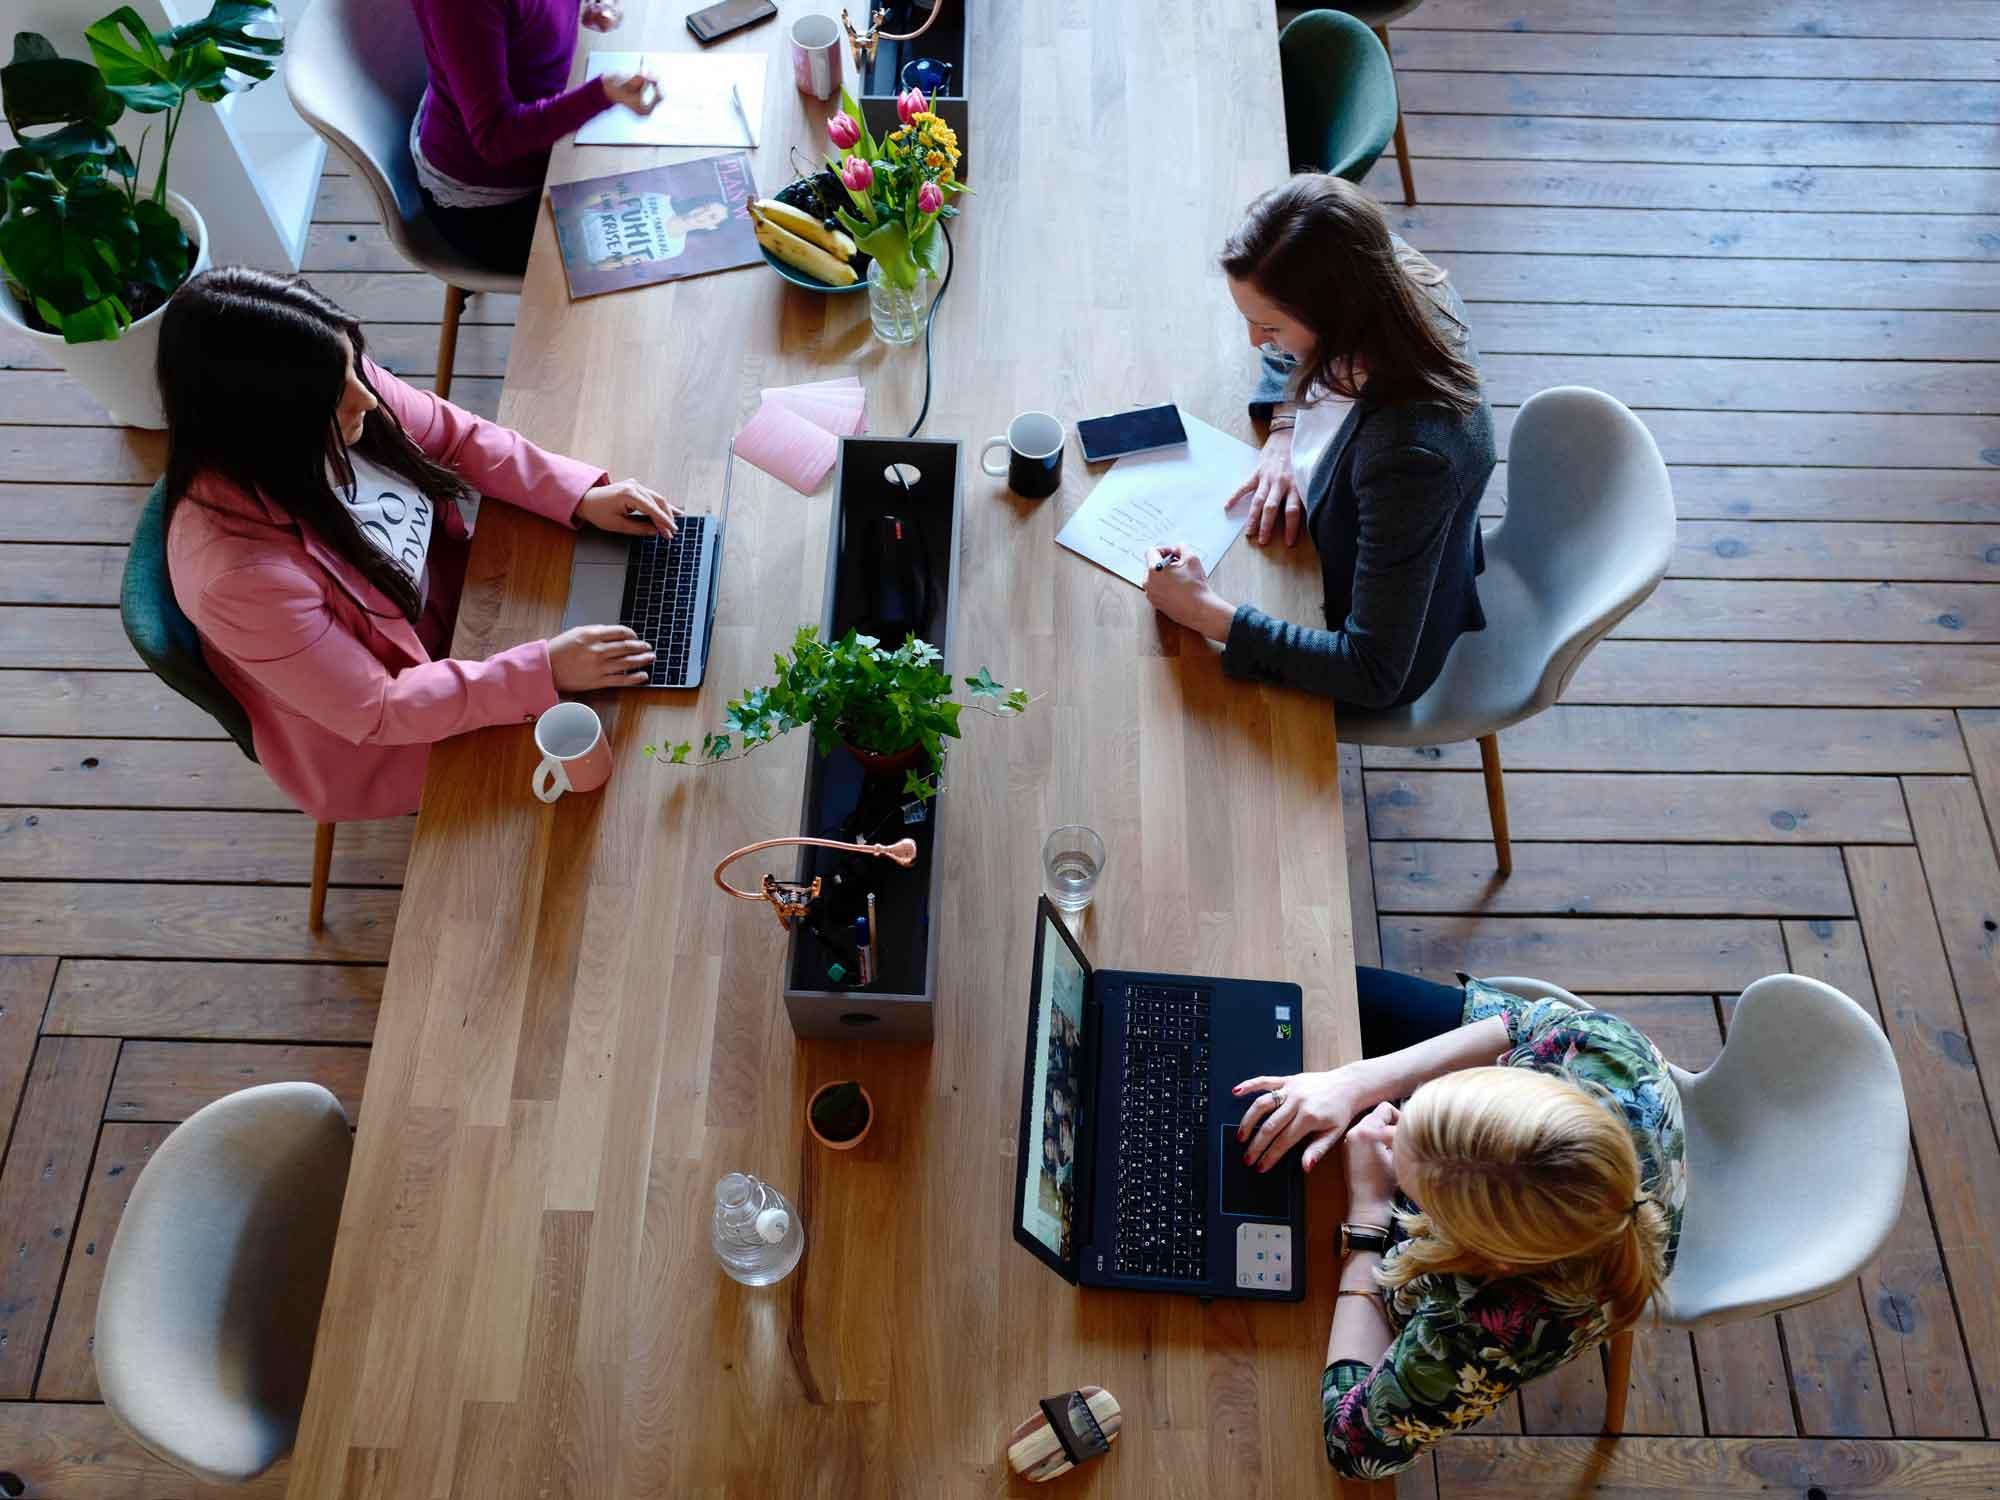 arbeitsplatz_design_trends_gruppenarbeits_platz_großraumbüro